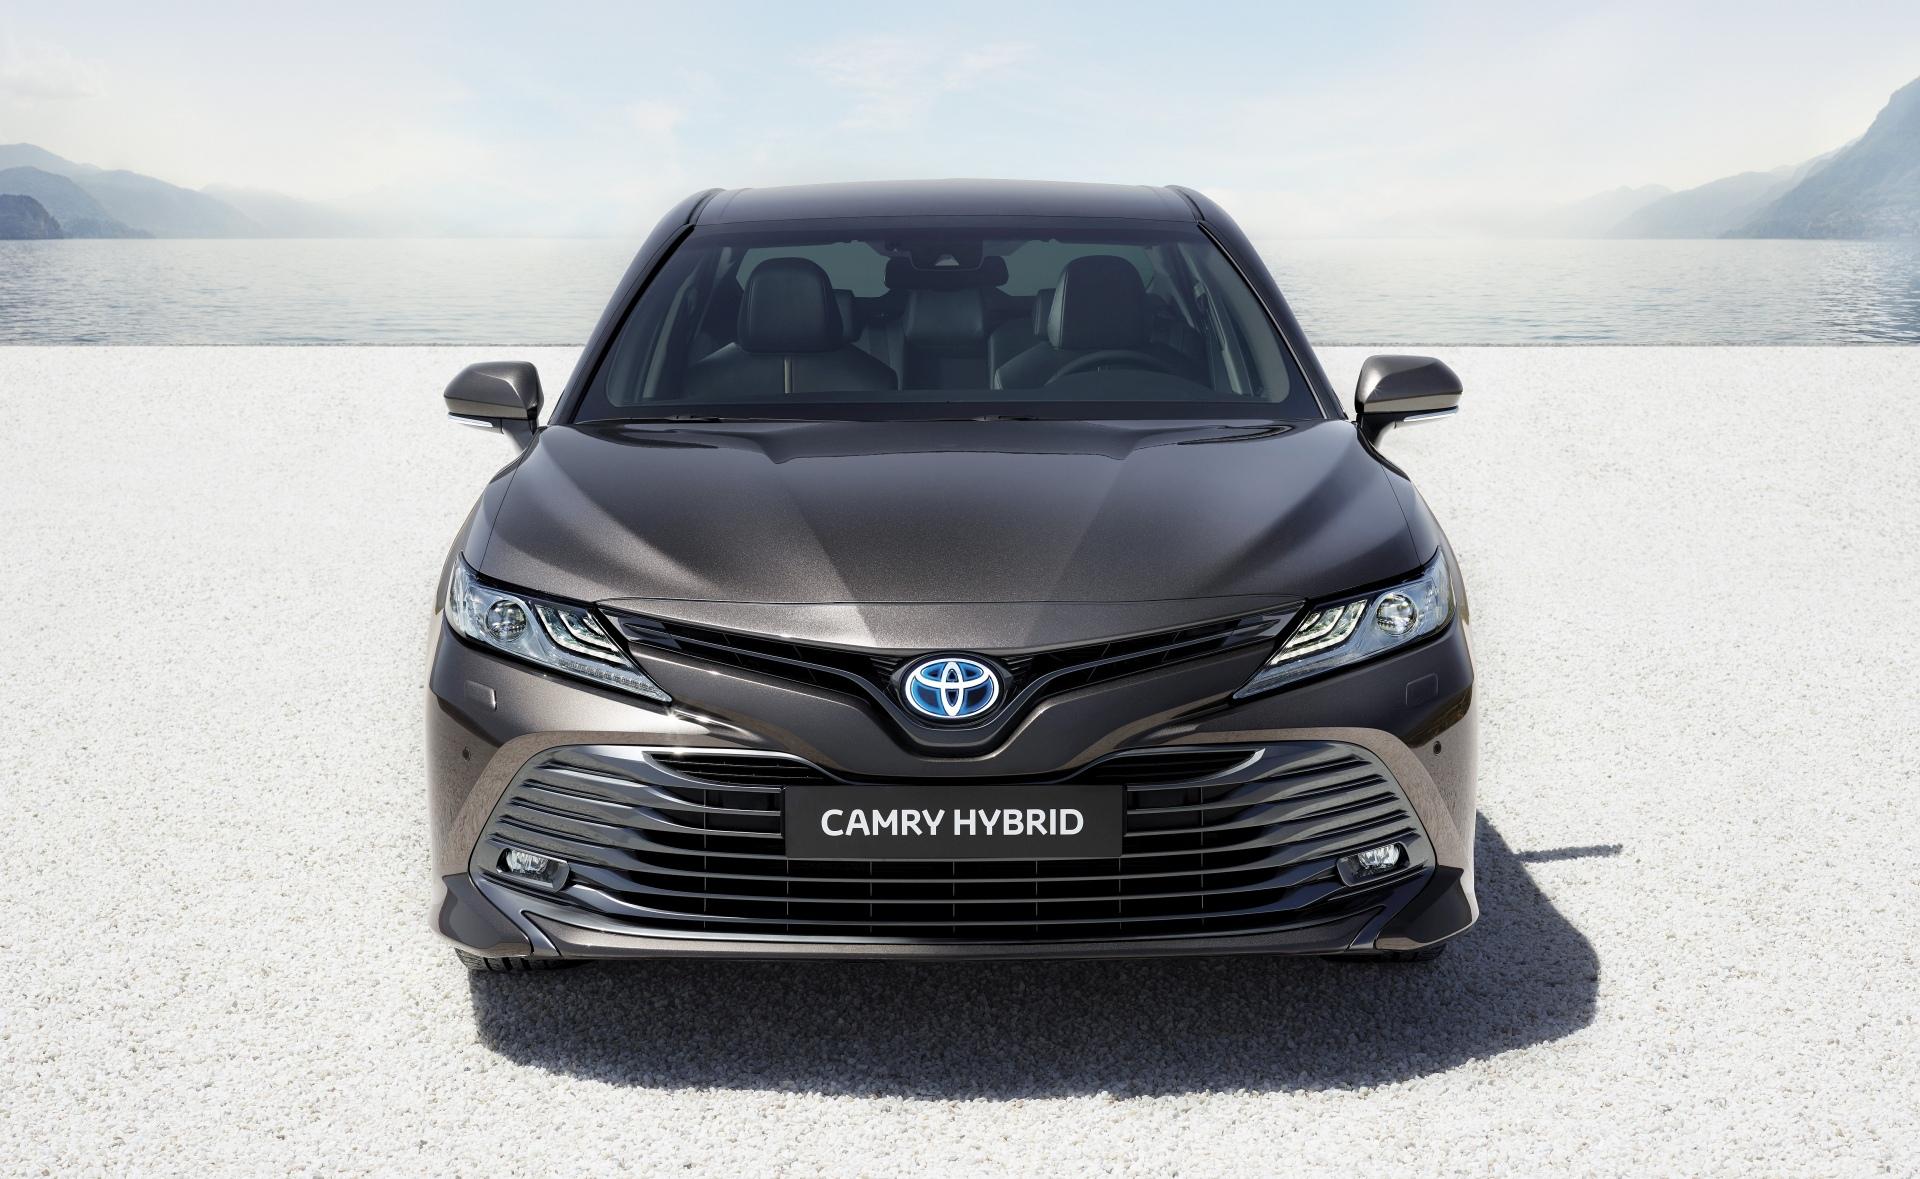 all new camry hybrid vellfire 2015 interior toyota 2019  oto jak wygląda następca